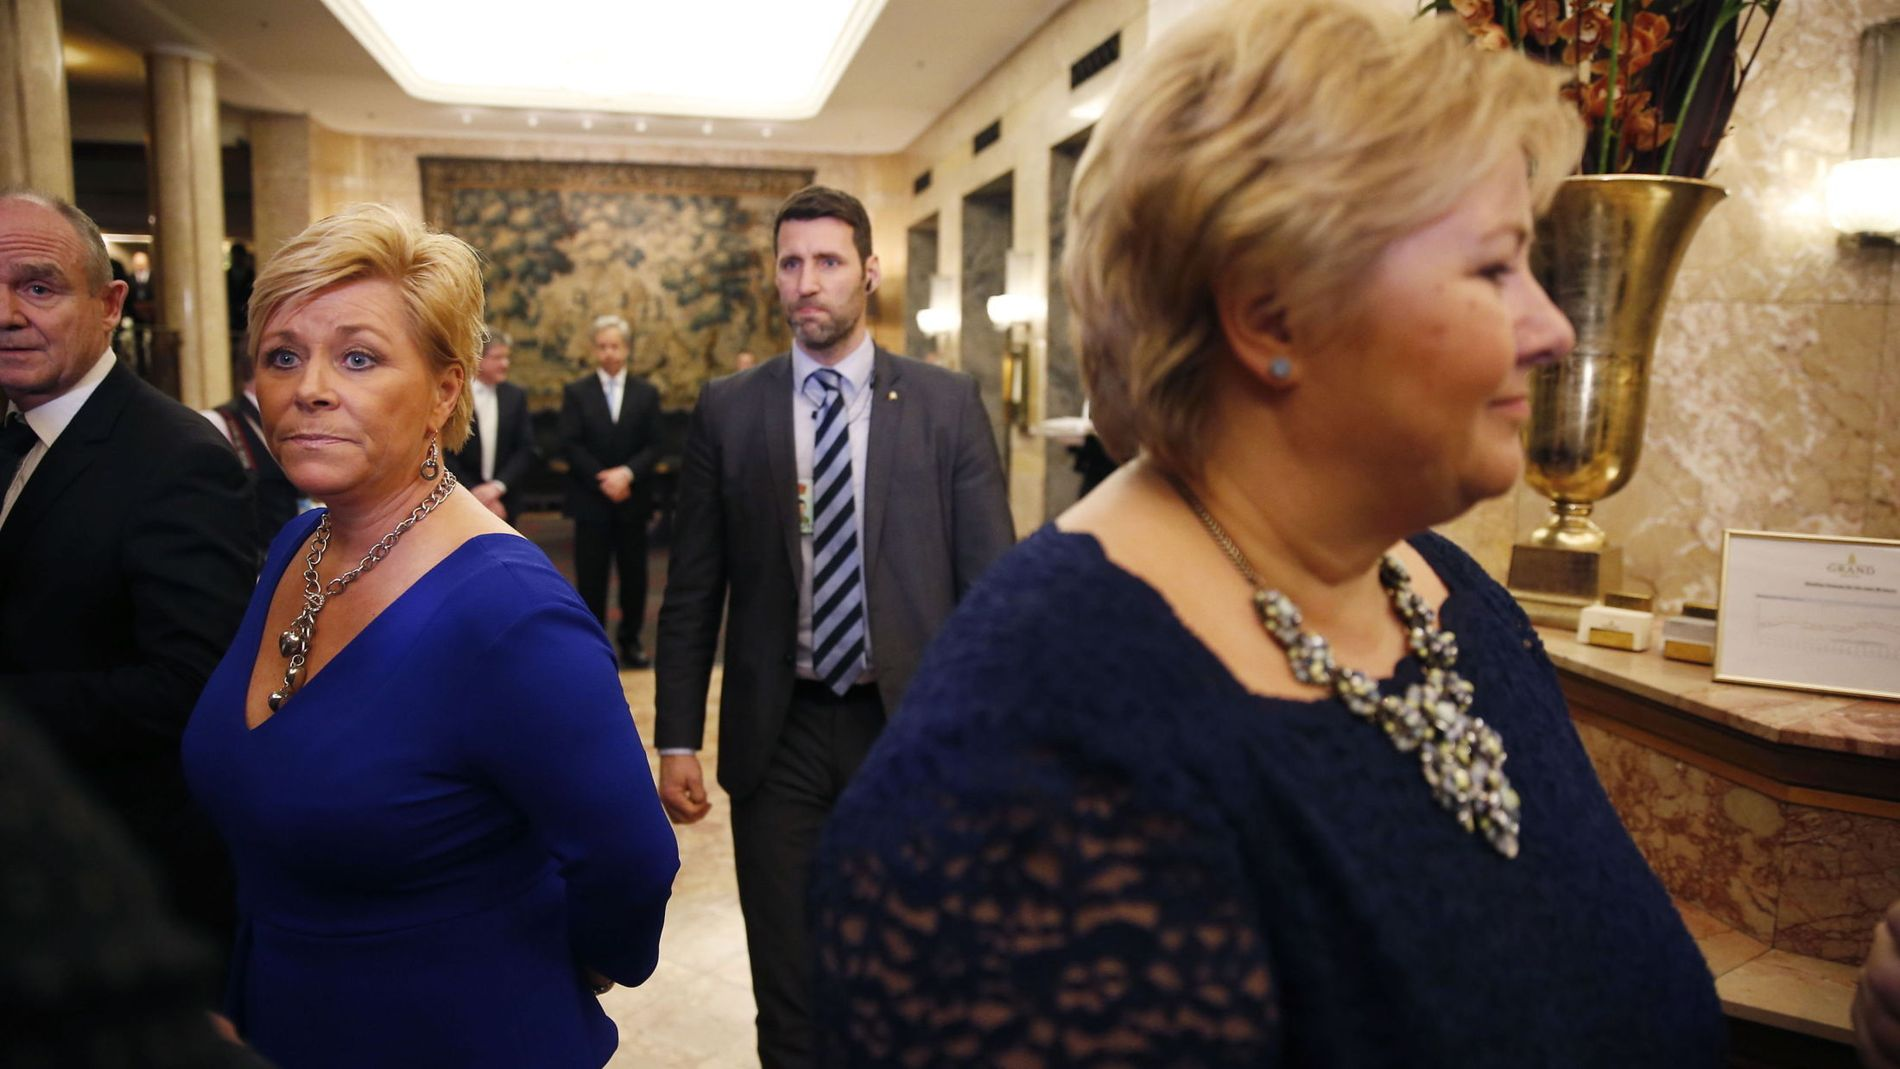 SKATTEDELT: Finansminister og Frp-leder Siv Jensen, her sammen med statsminister og Høyre-leder Erna Solberg på Grand Hotel under Norges Banks årlige middag.